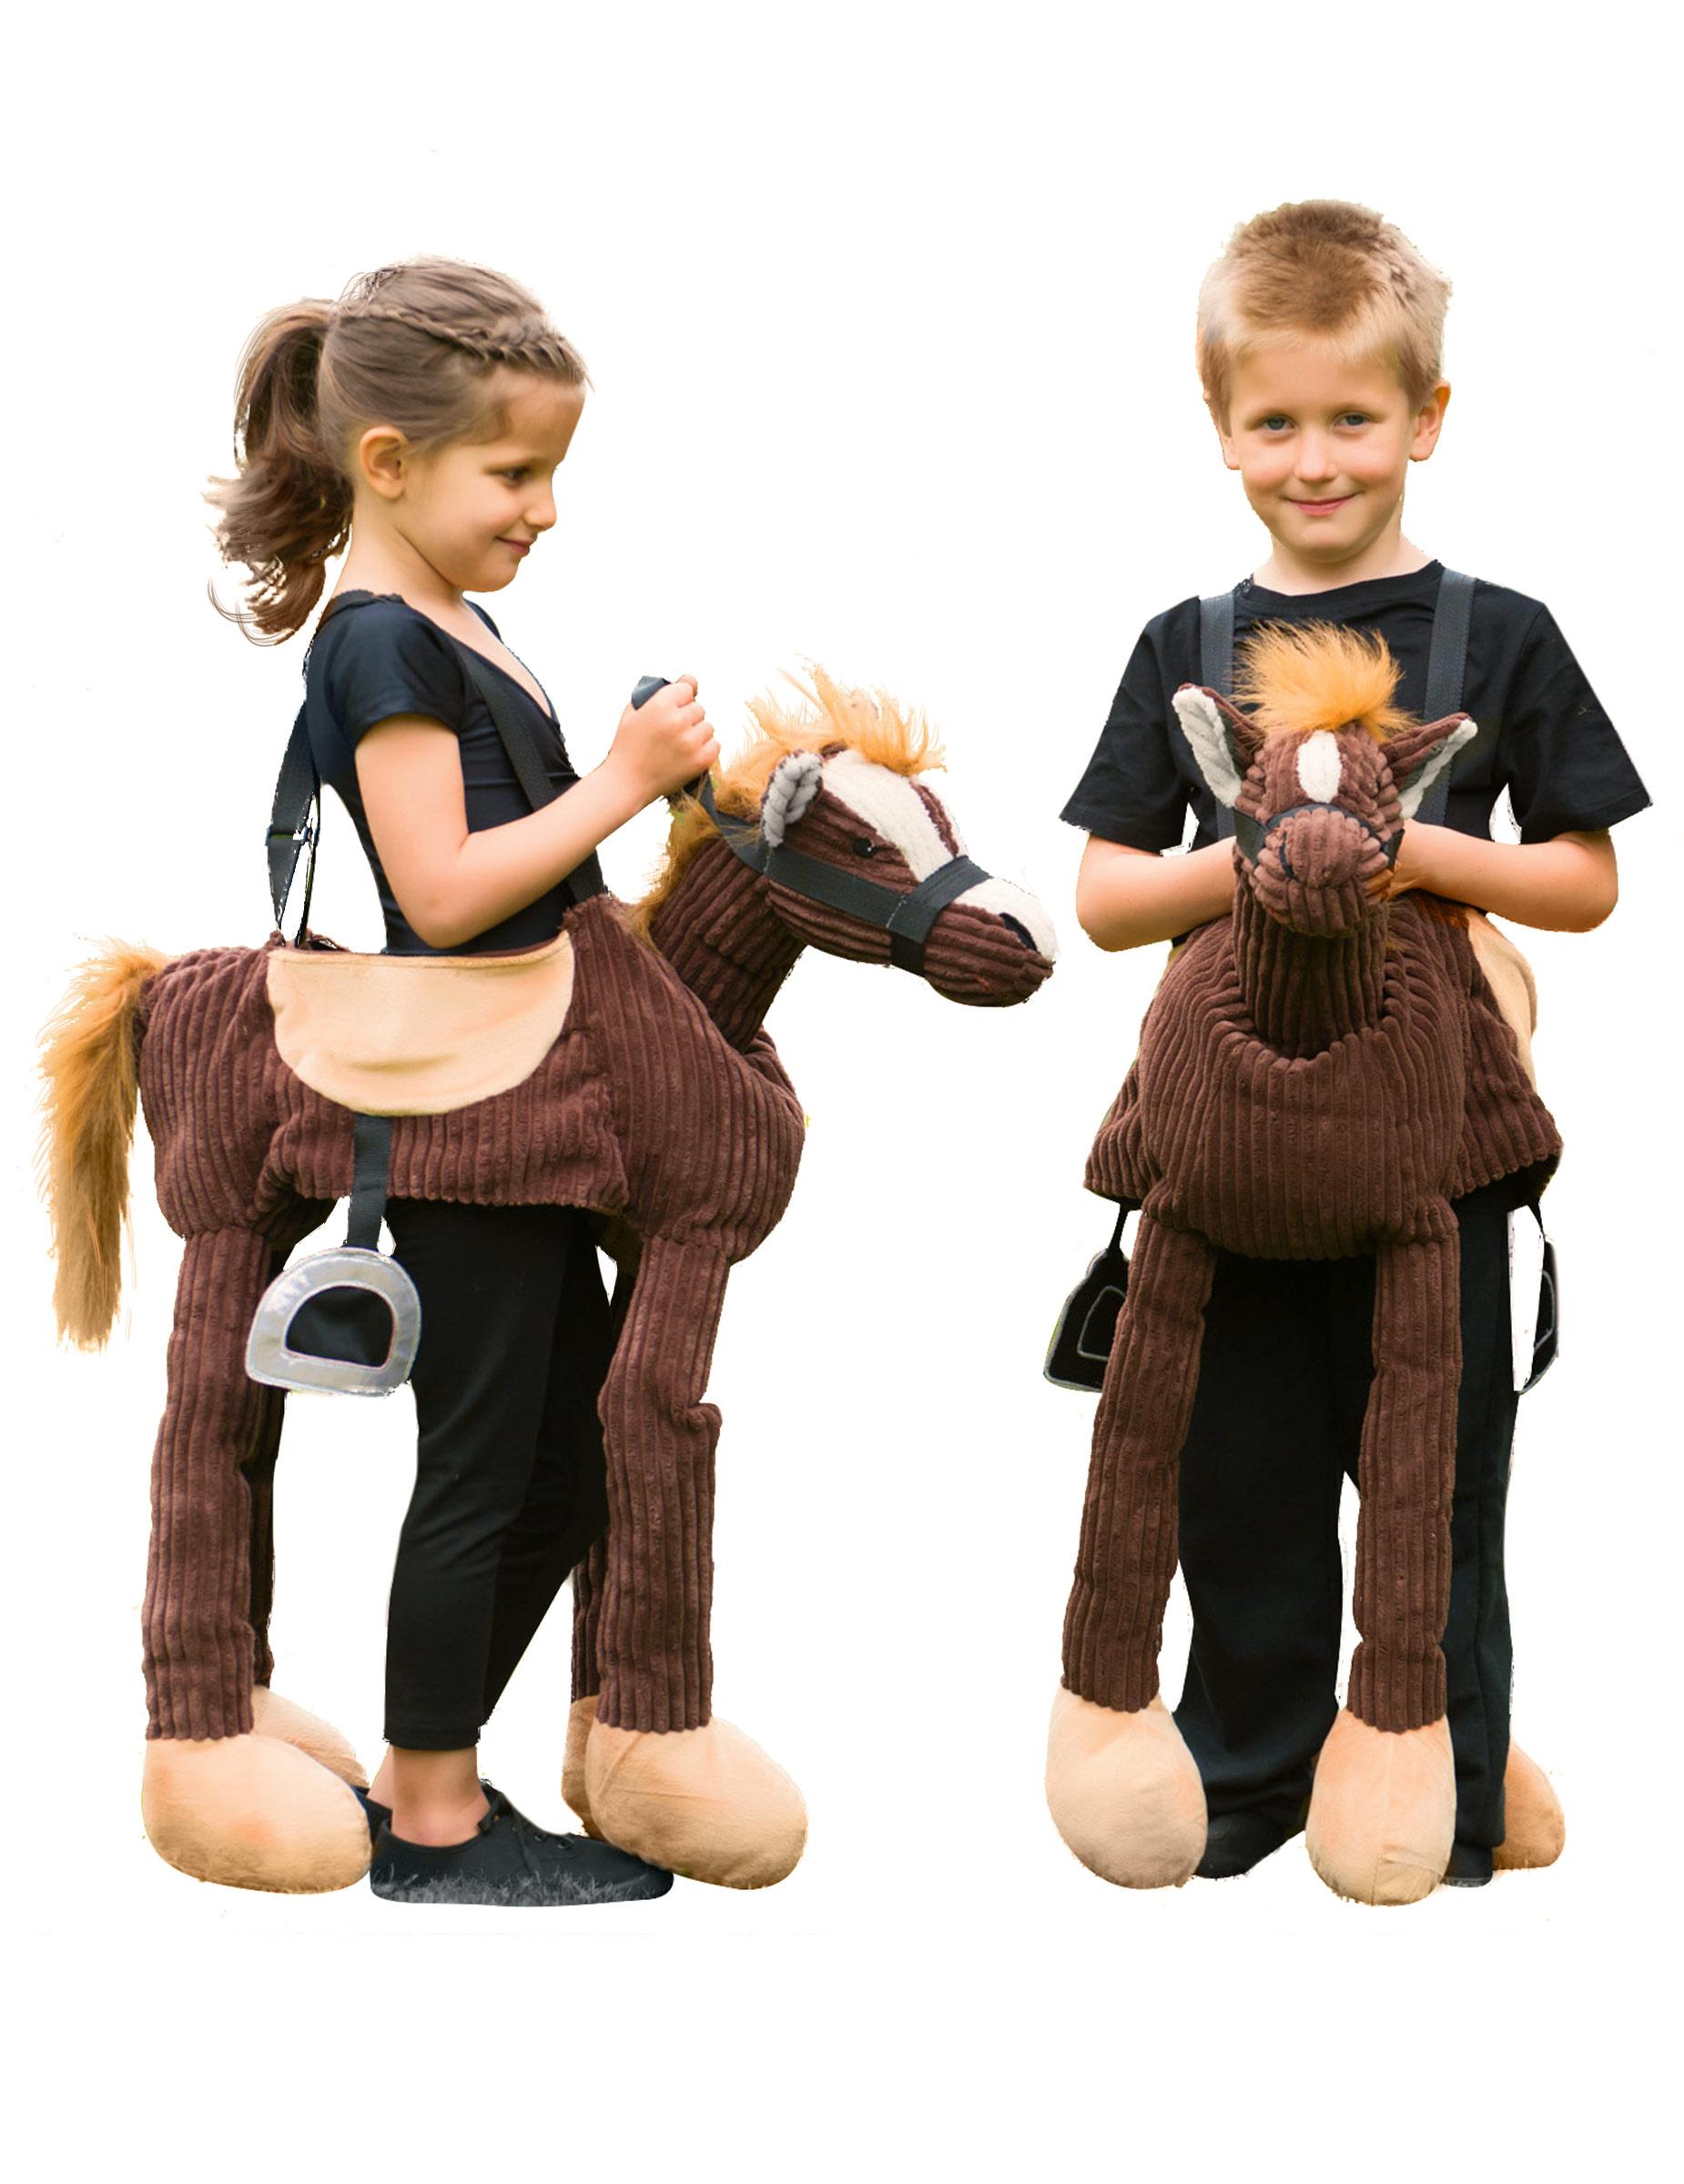 Typ im Pferdekostüm